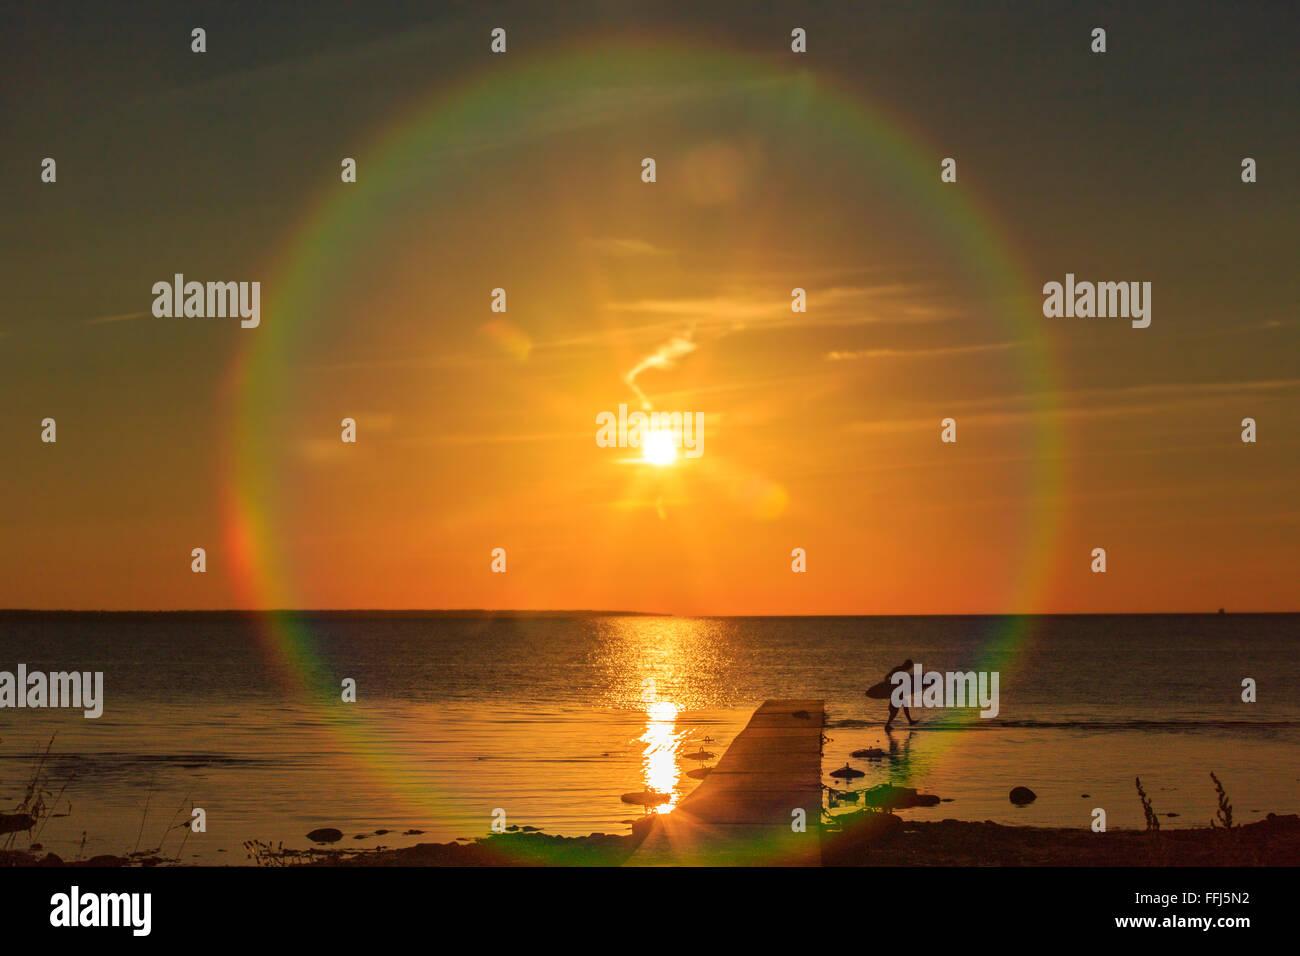 Man Surfing sunset - Stock Image